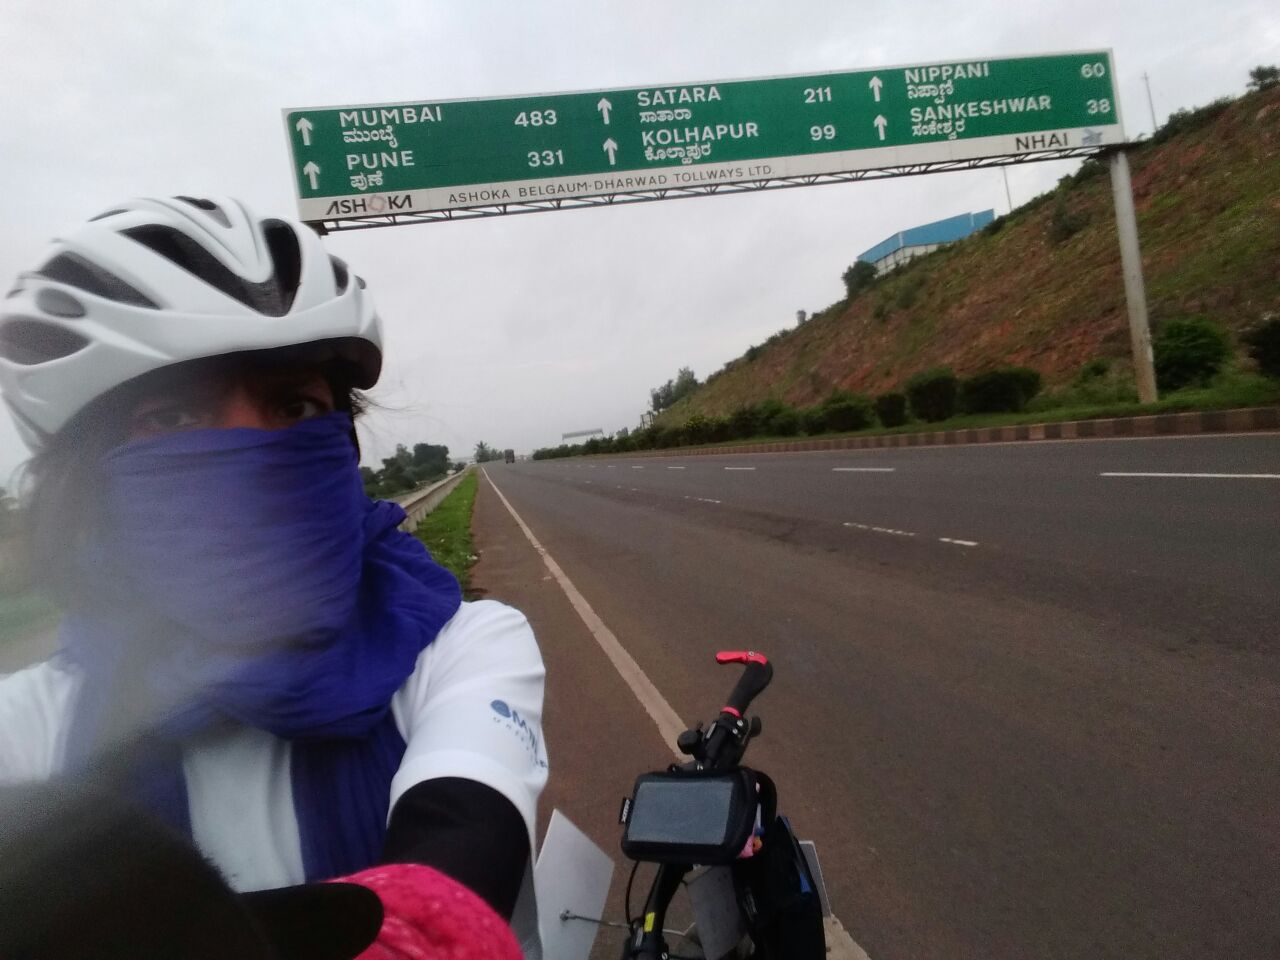 Long way to go- Kolhapur 99 kilometres